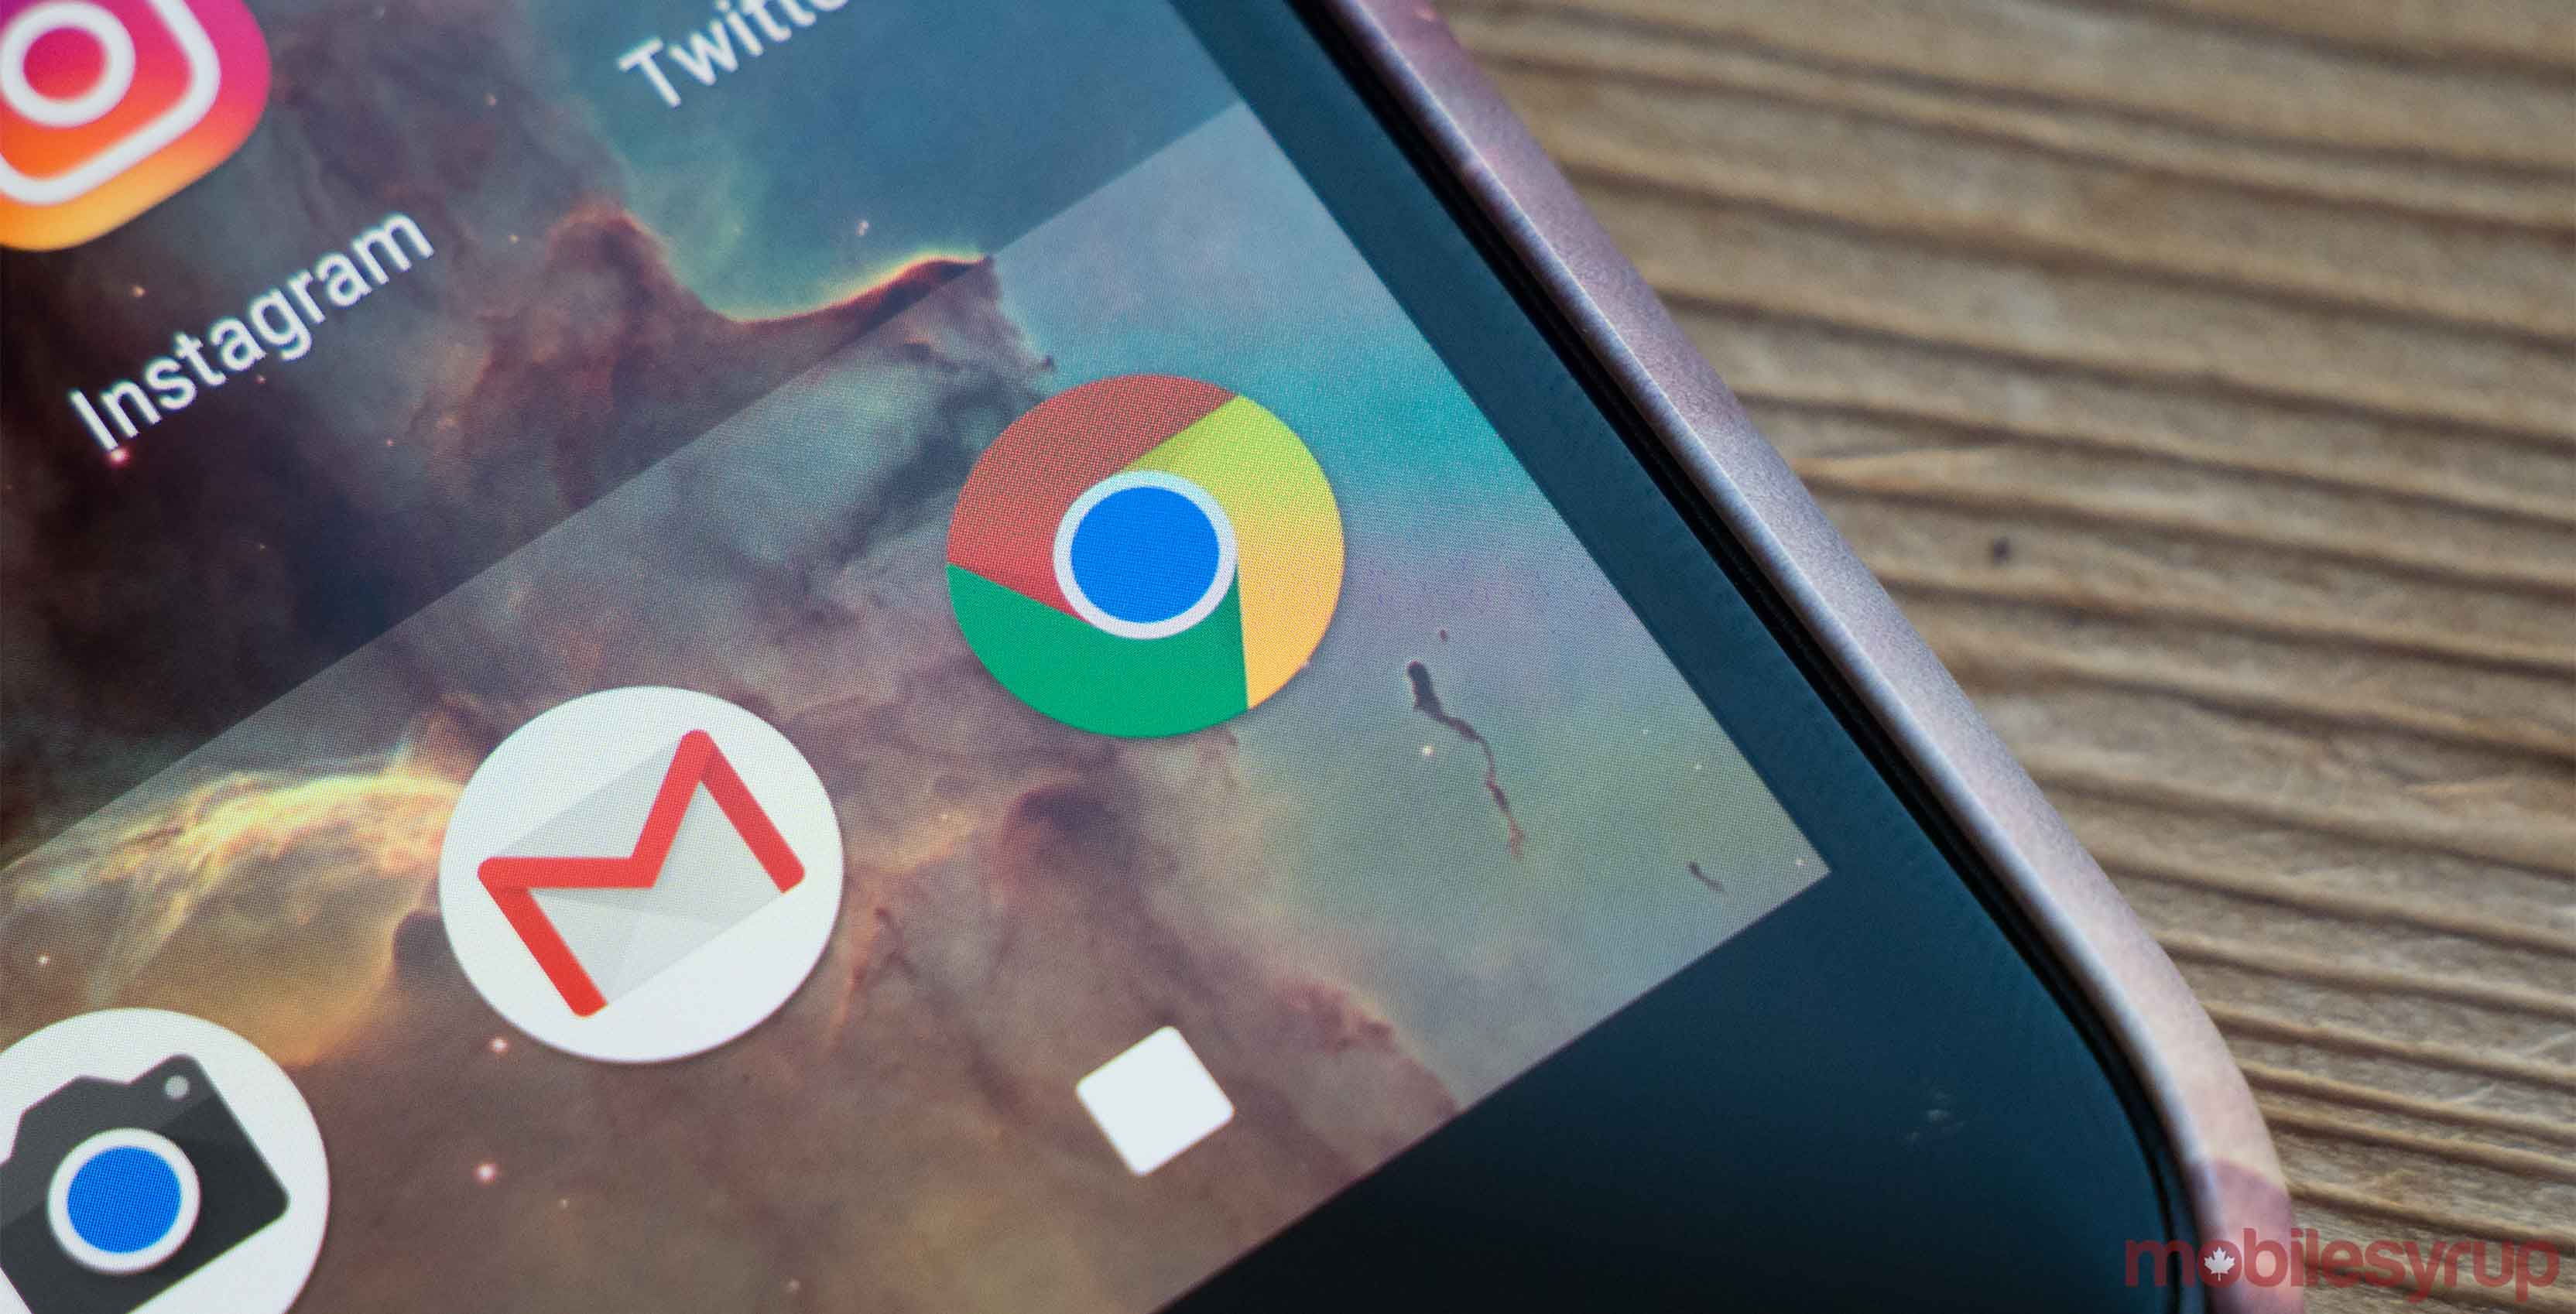 Google Chrome and G-mail app